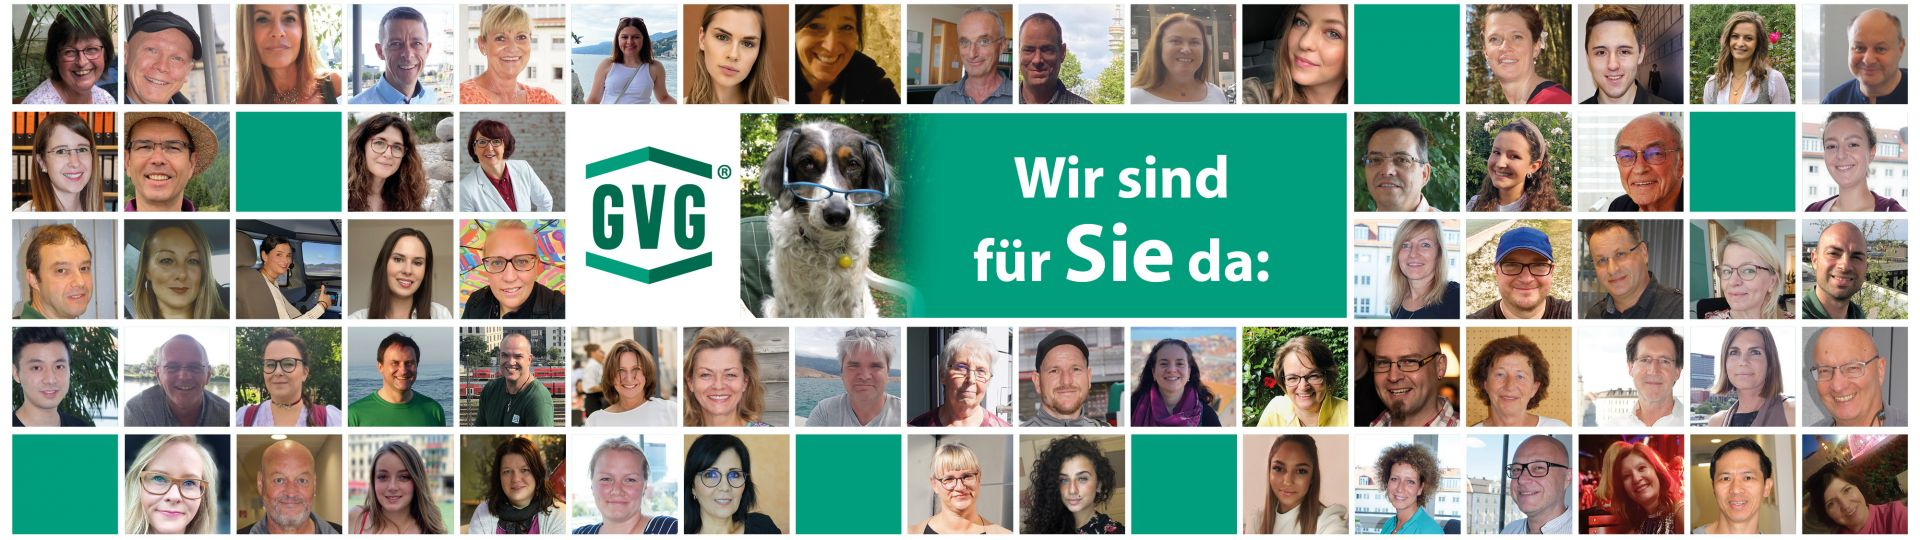 Collage Team 23.09.2021 WEB - Team